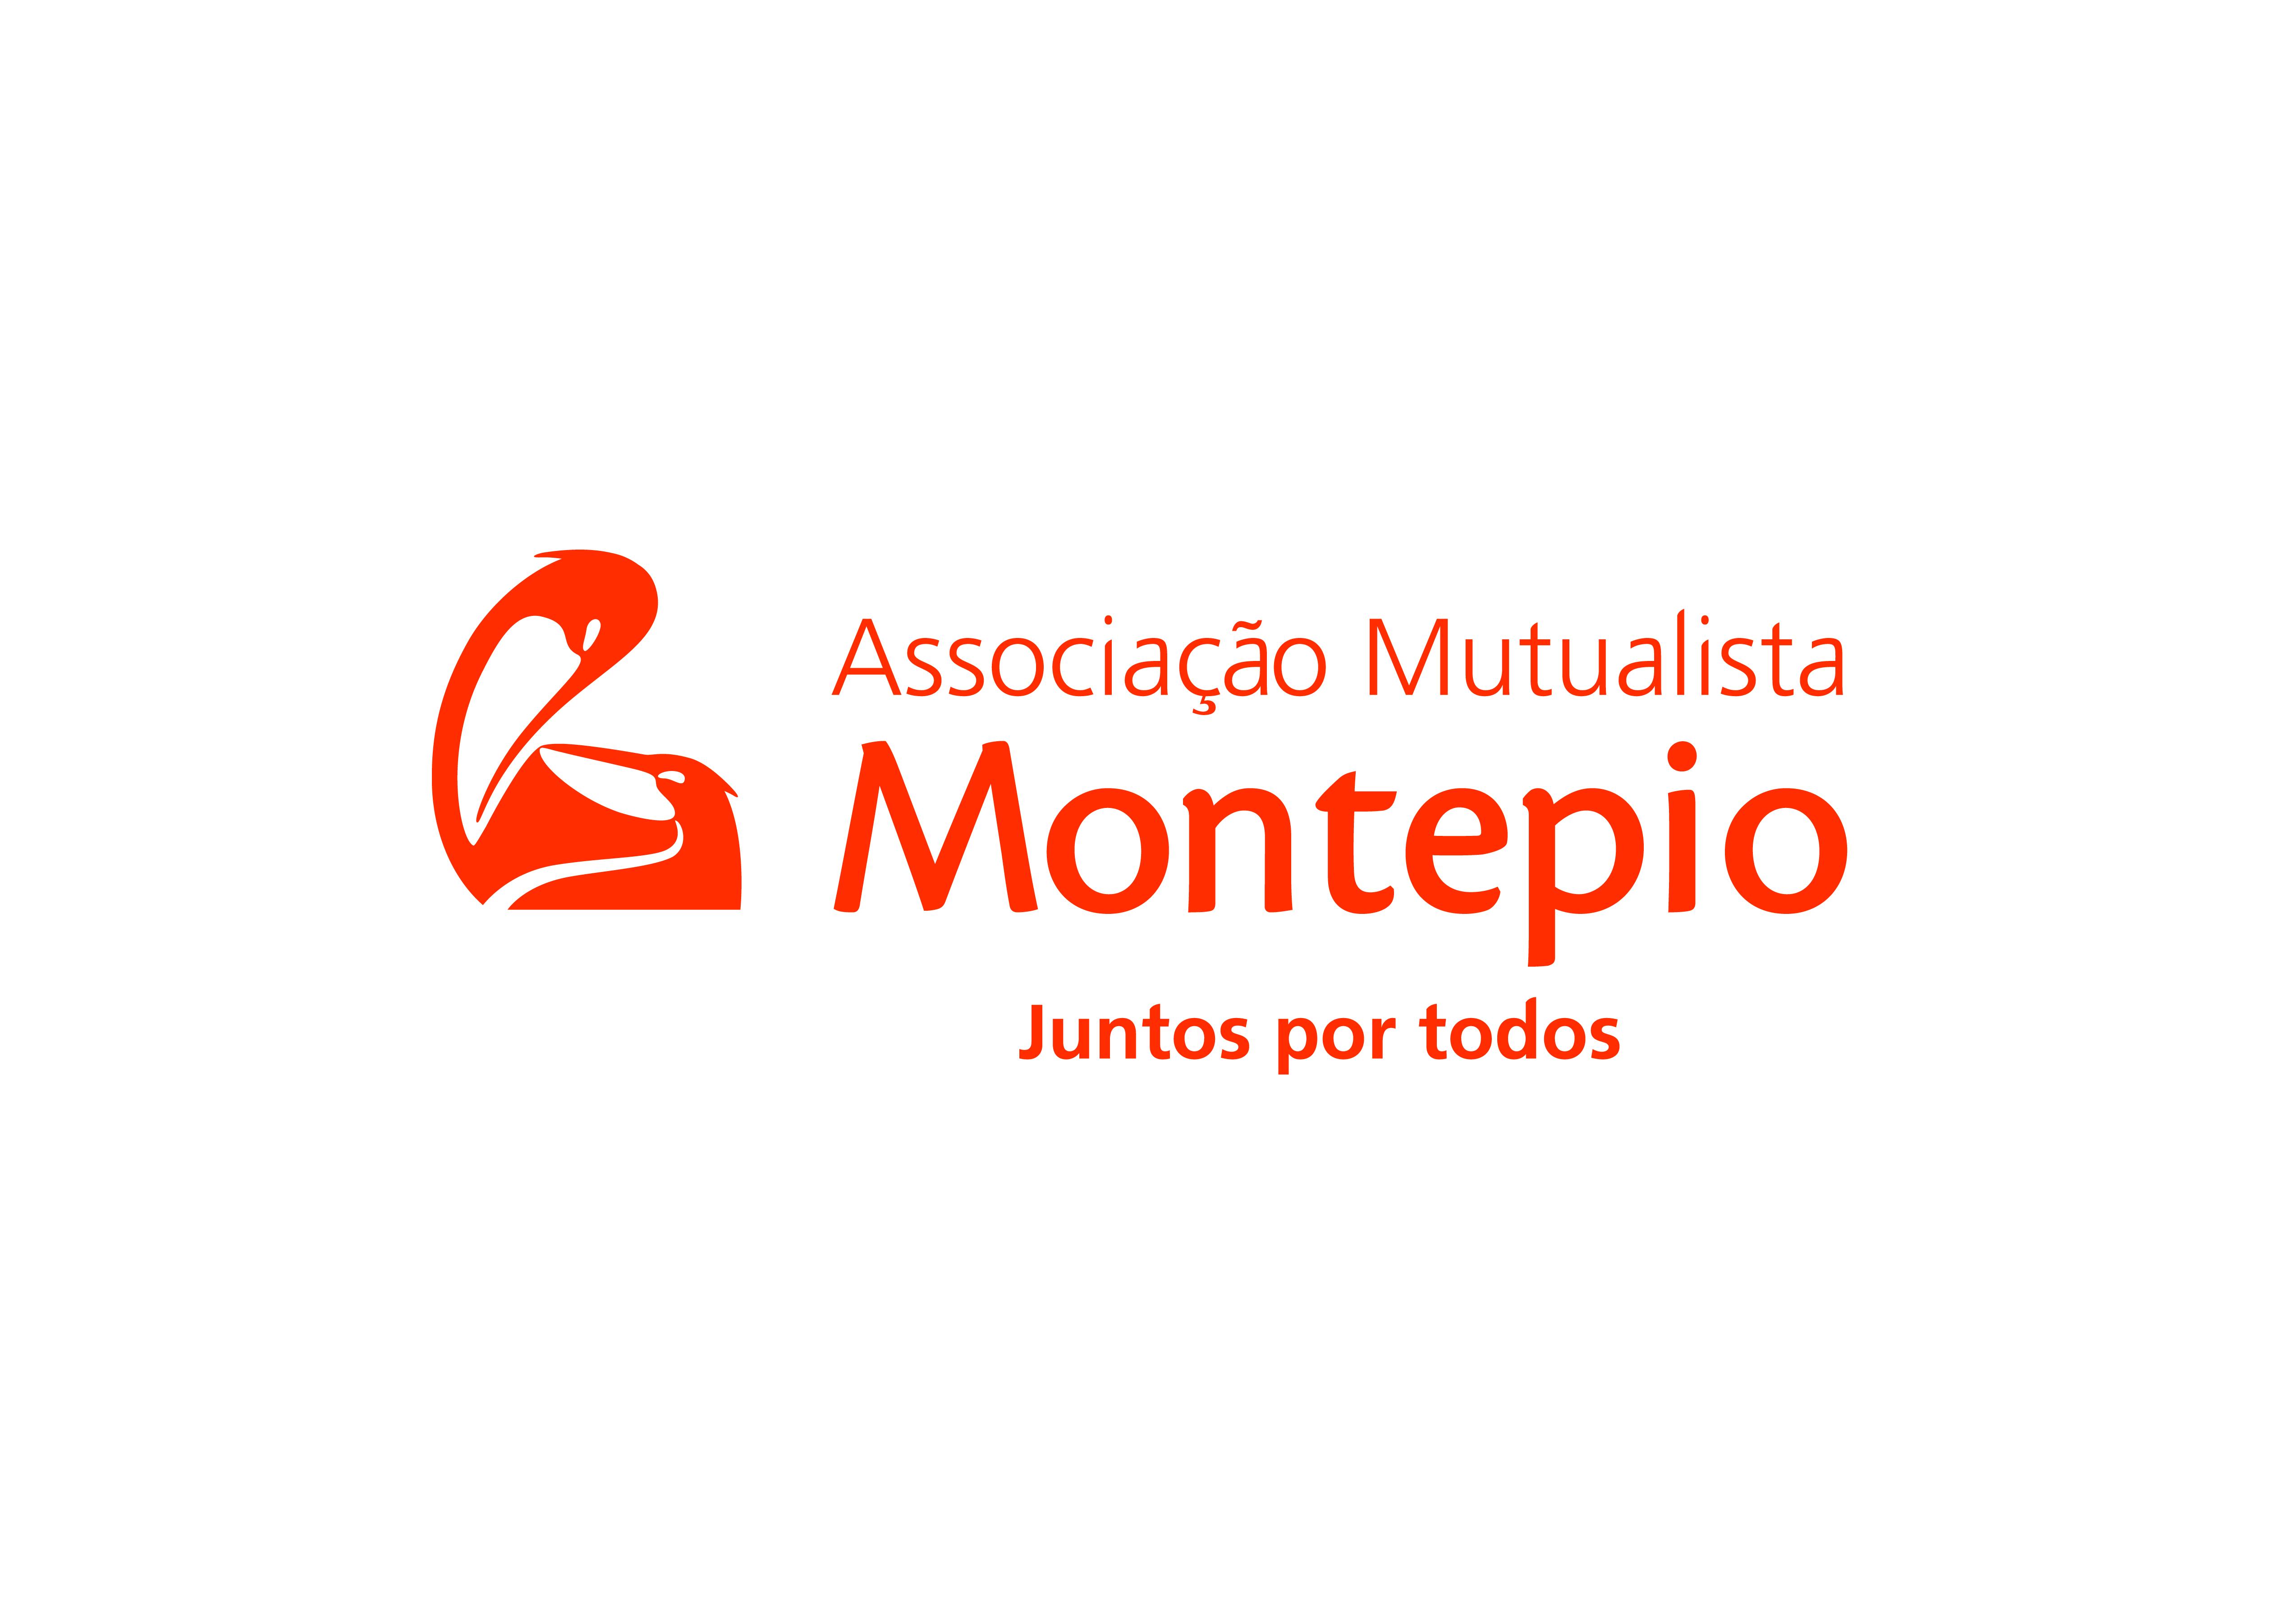 Af_Identidade_PantoneC_AssoMutualistaAssinaturaLaranja_Baixo